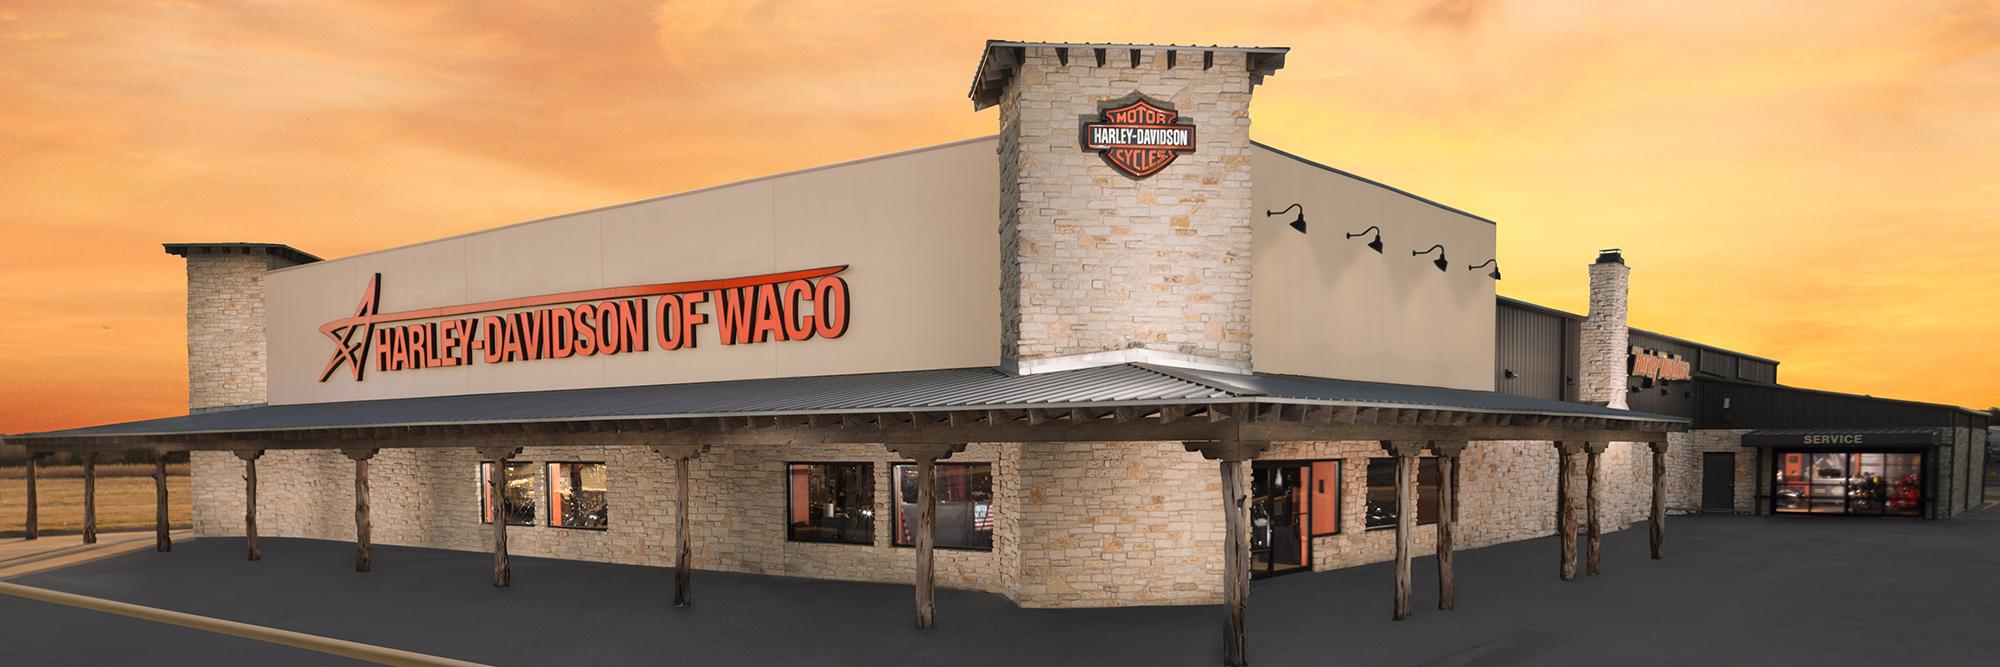 Harley Davidson of Waco